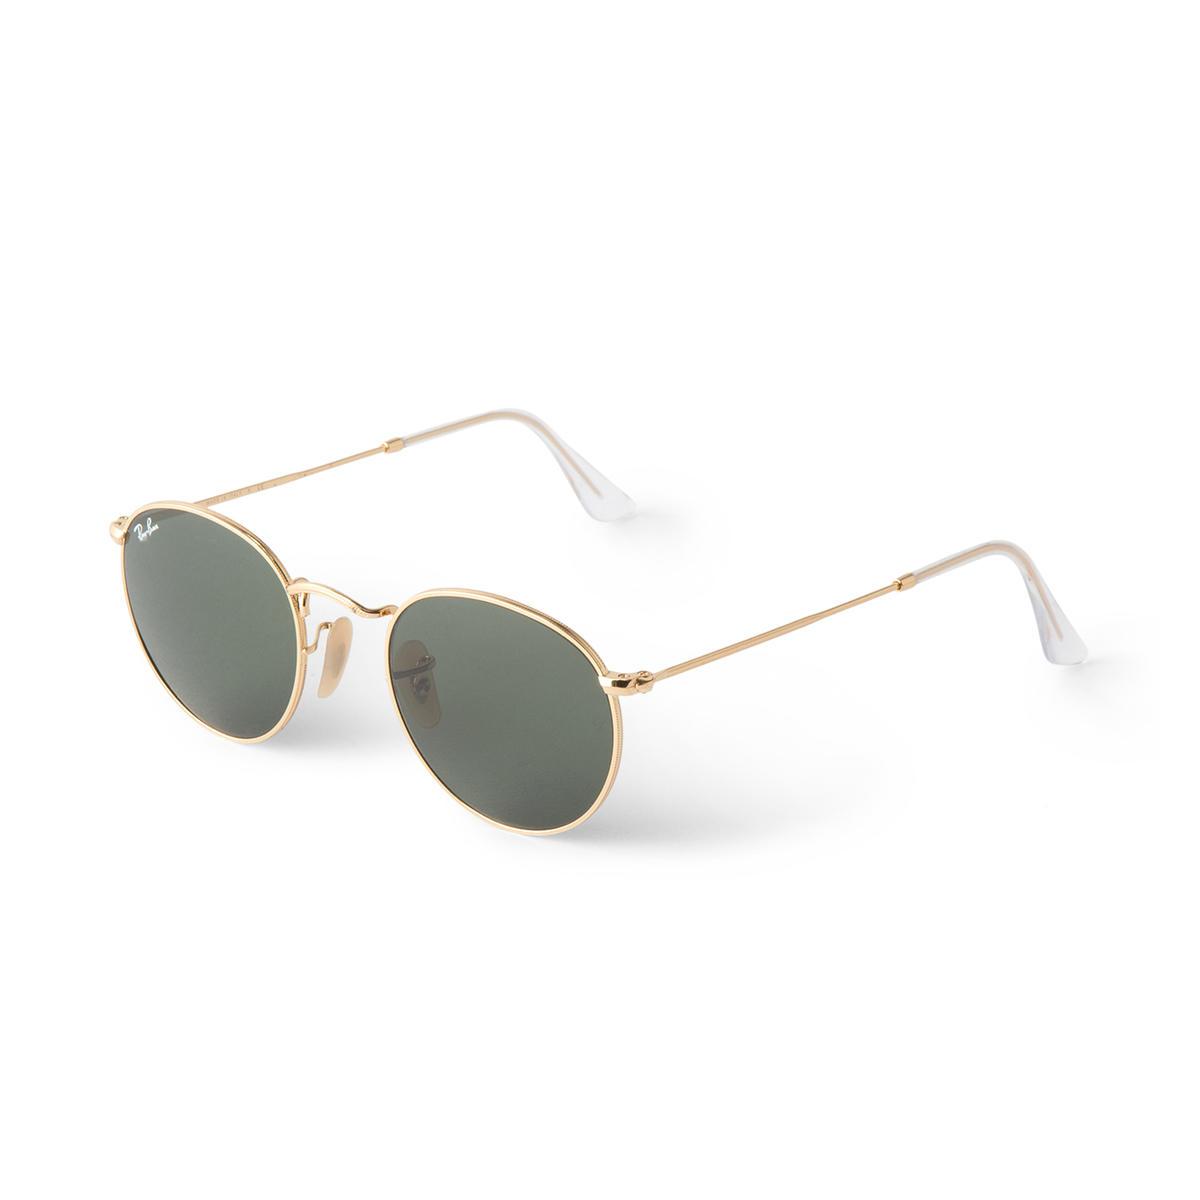 _rayban-round-metal-sunglasses-green-classic-2.jpg